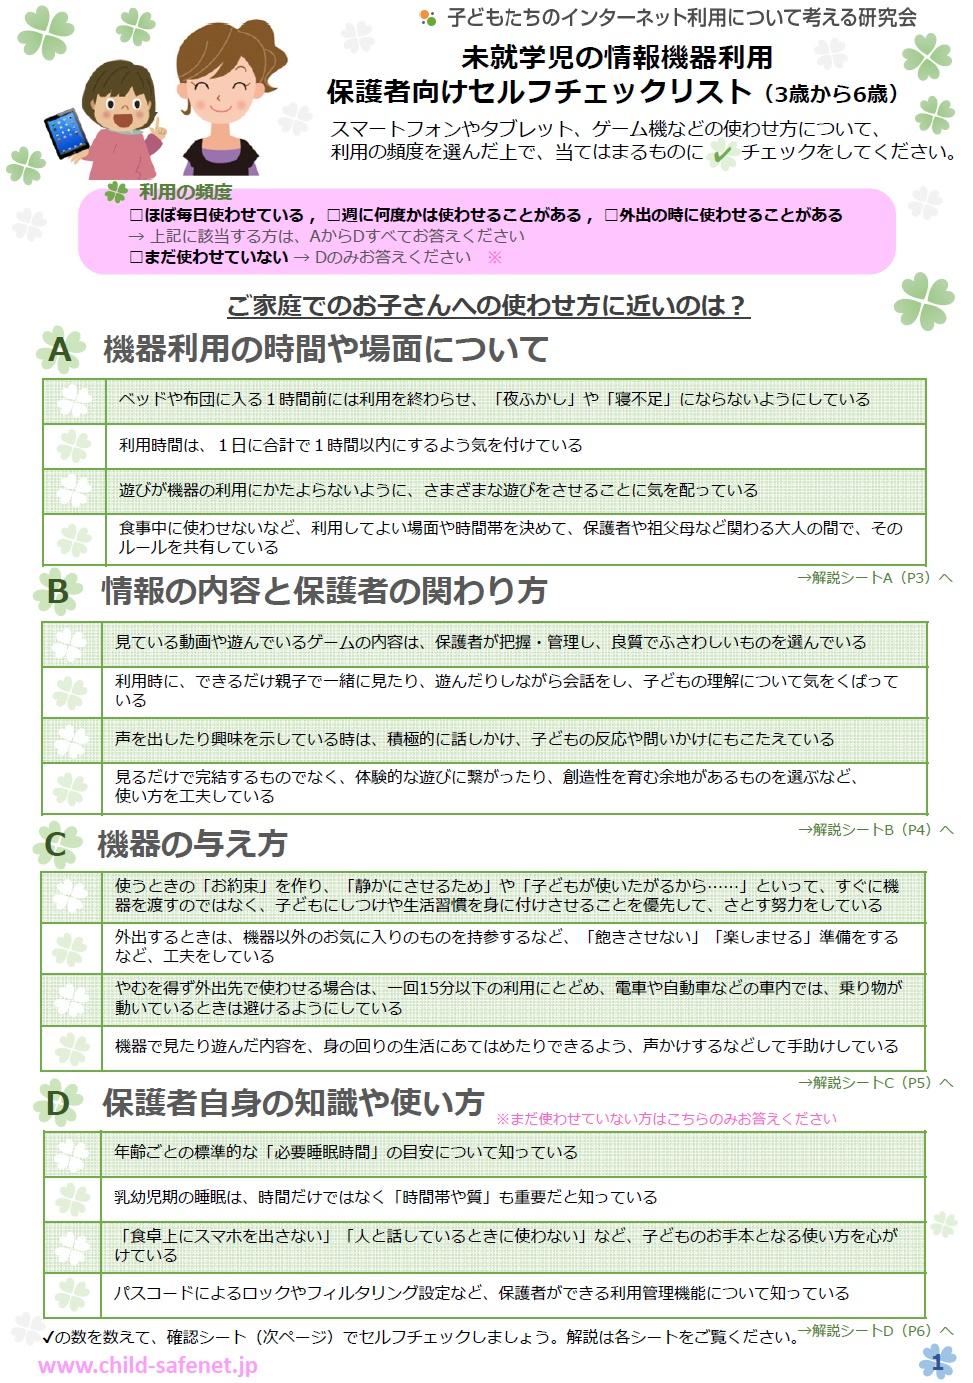 checklist_01.jpg